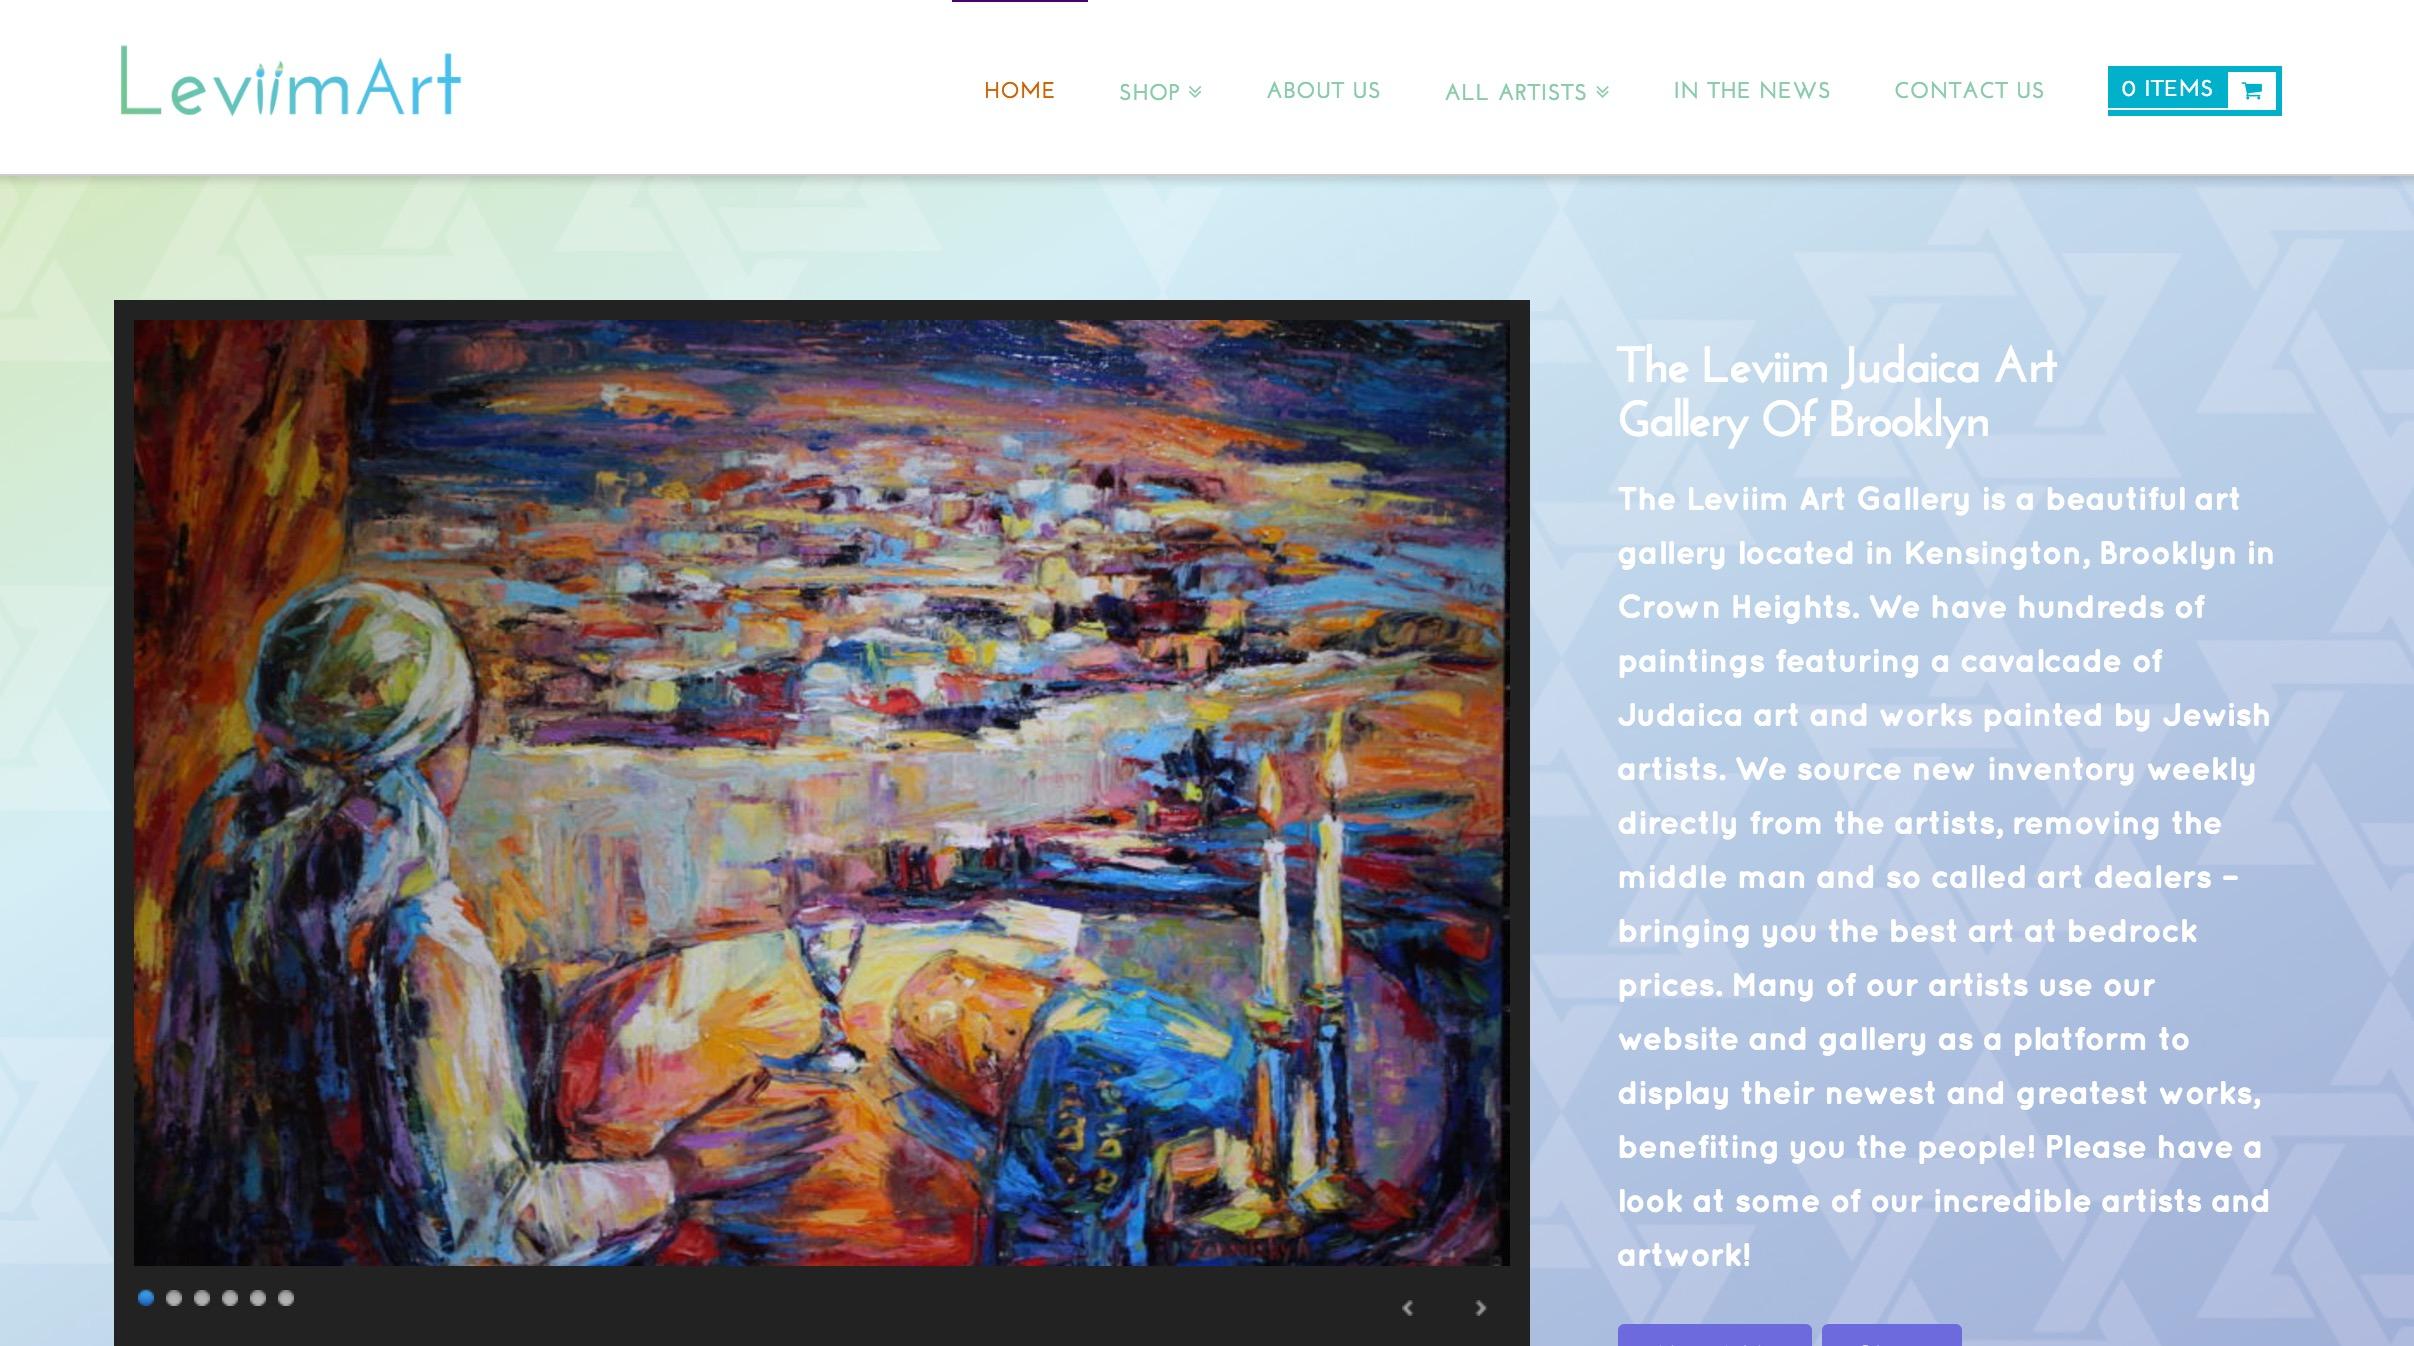 Leviim Judaica Art Gallery of Brooklyn